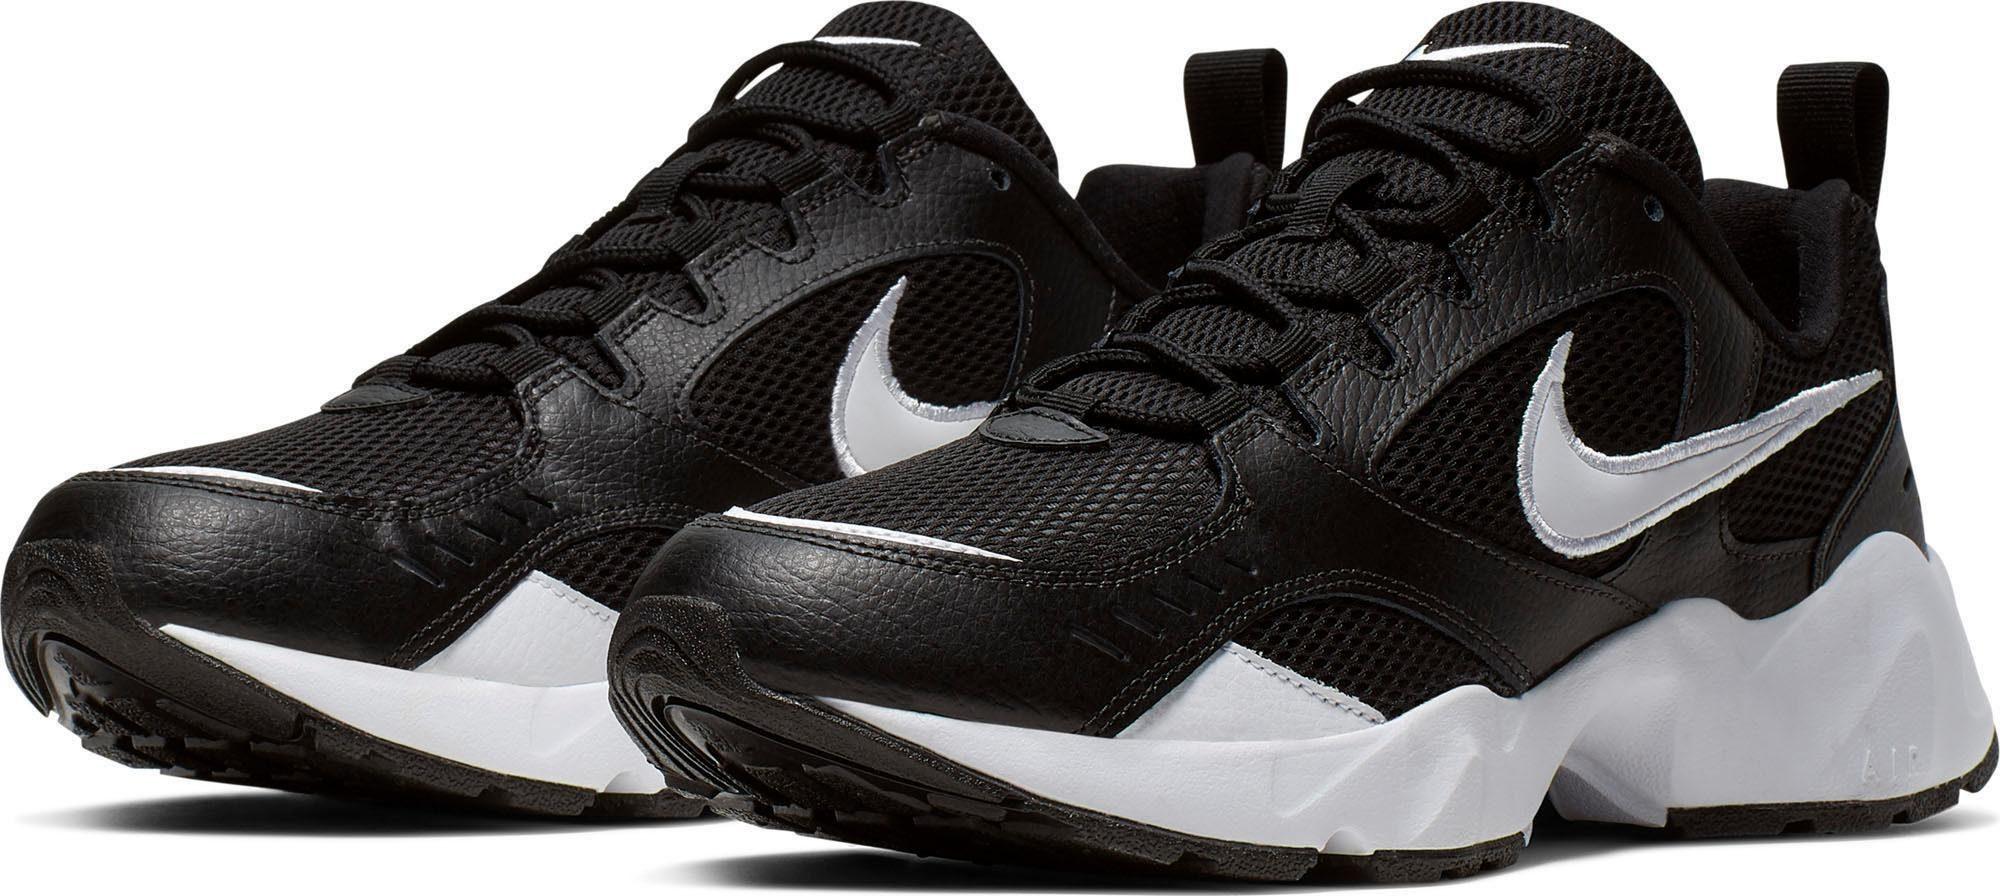 Nike Air Max Axis Herren Sneaker blackwhite 42, 69,90 €